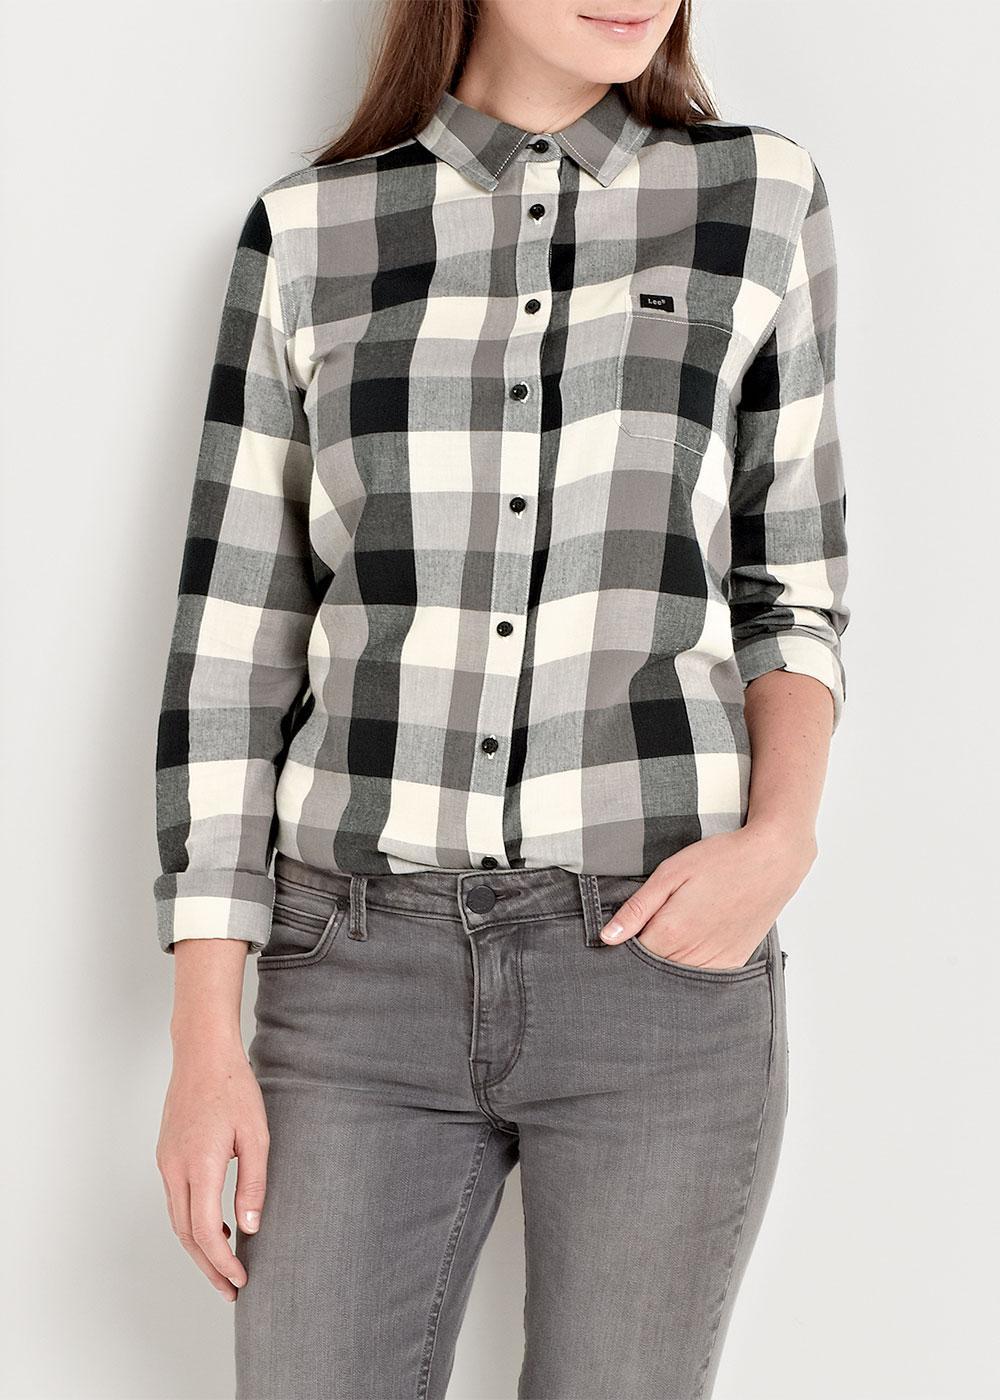 36673fd8f LEE JEANS Retro 70s One Pocket Block Check Shirt Crimson Black